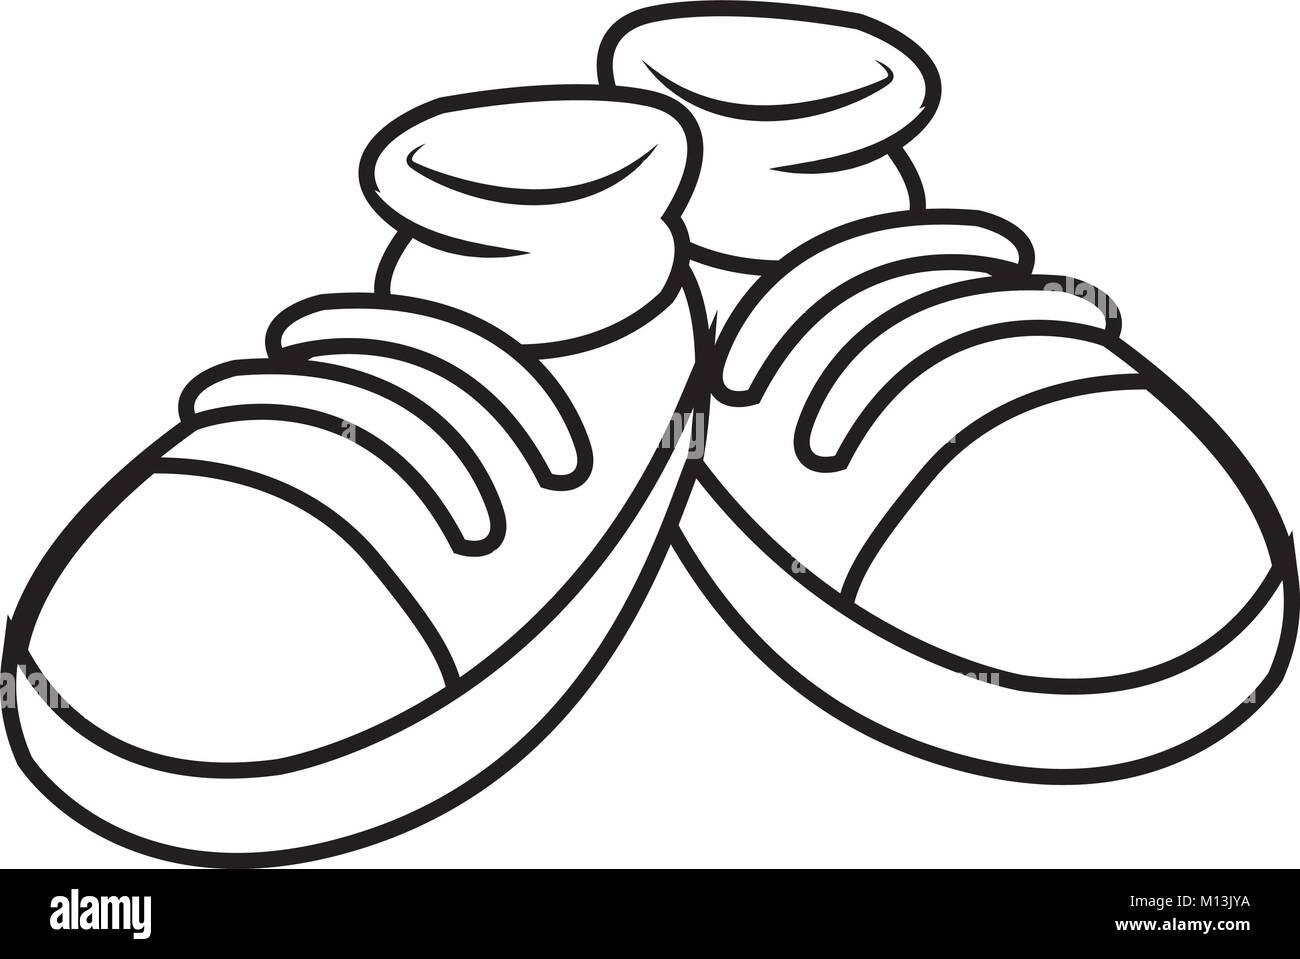 pair of shoes cartoon stock vector art illustration vector image